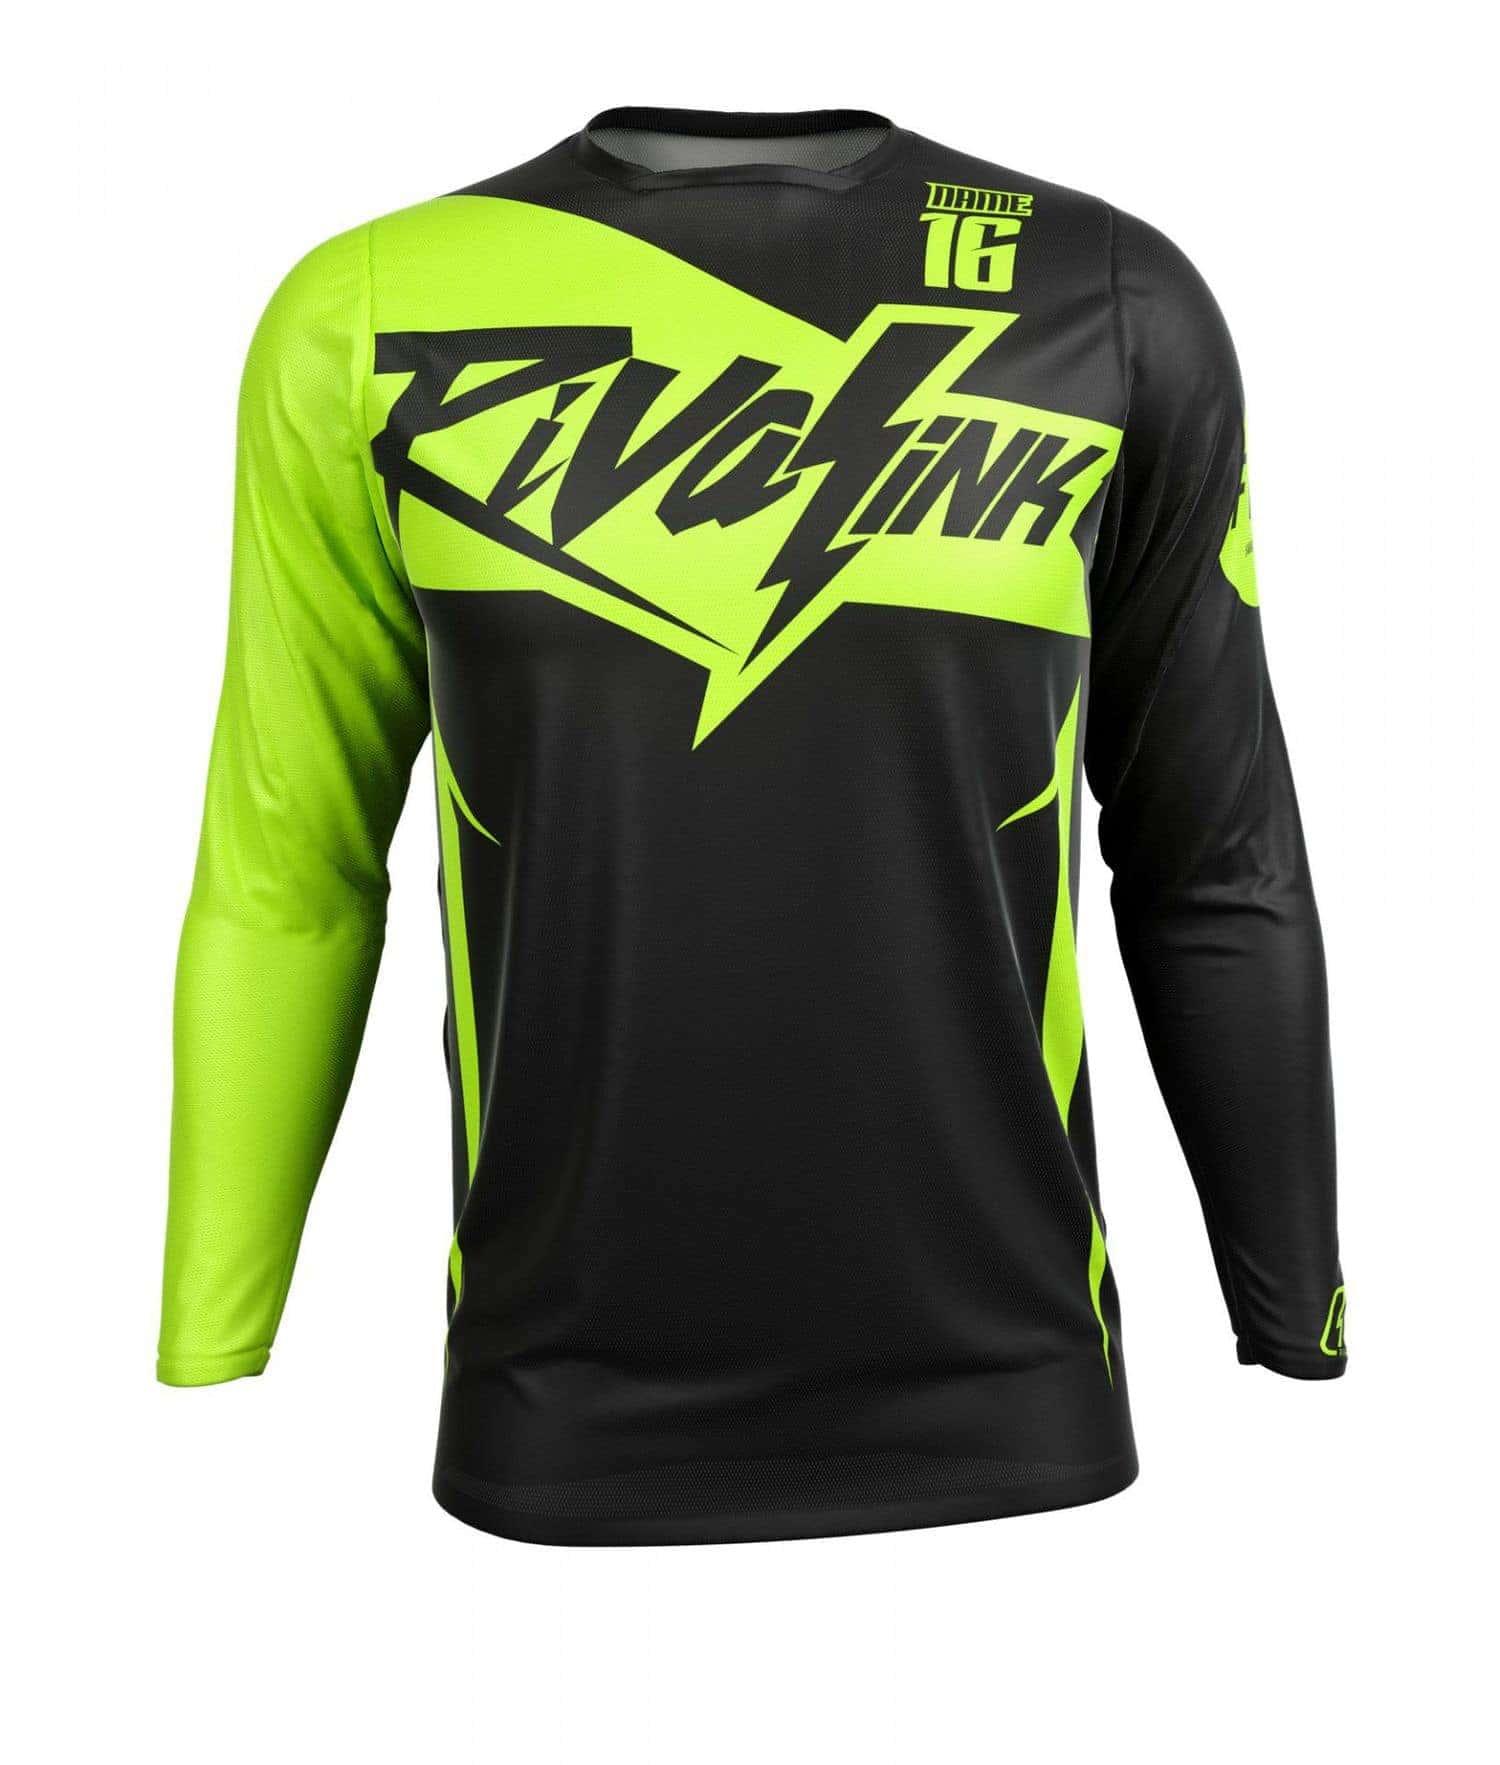 Neon yellow kit rival ink design co custom motocross graphics - Shop